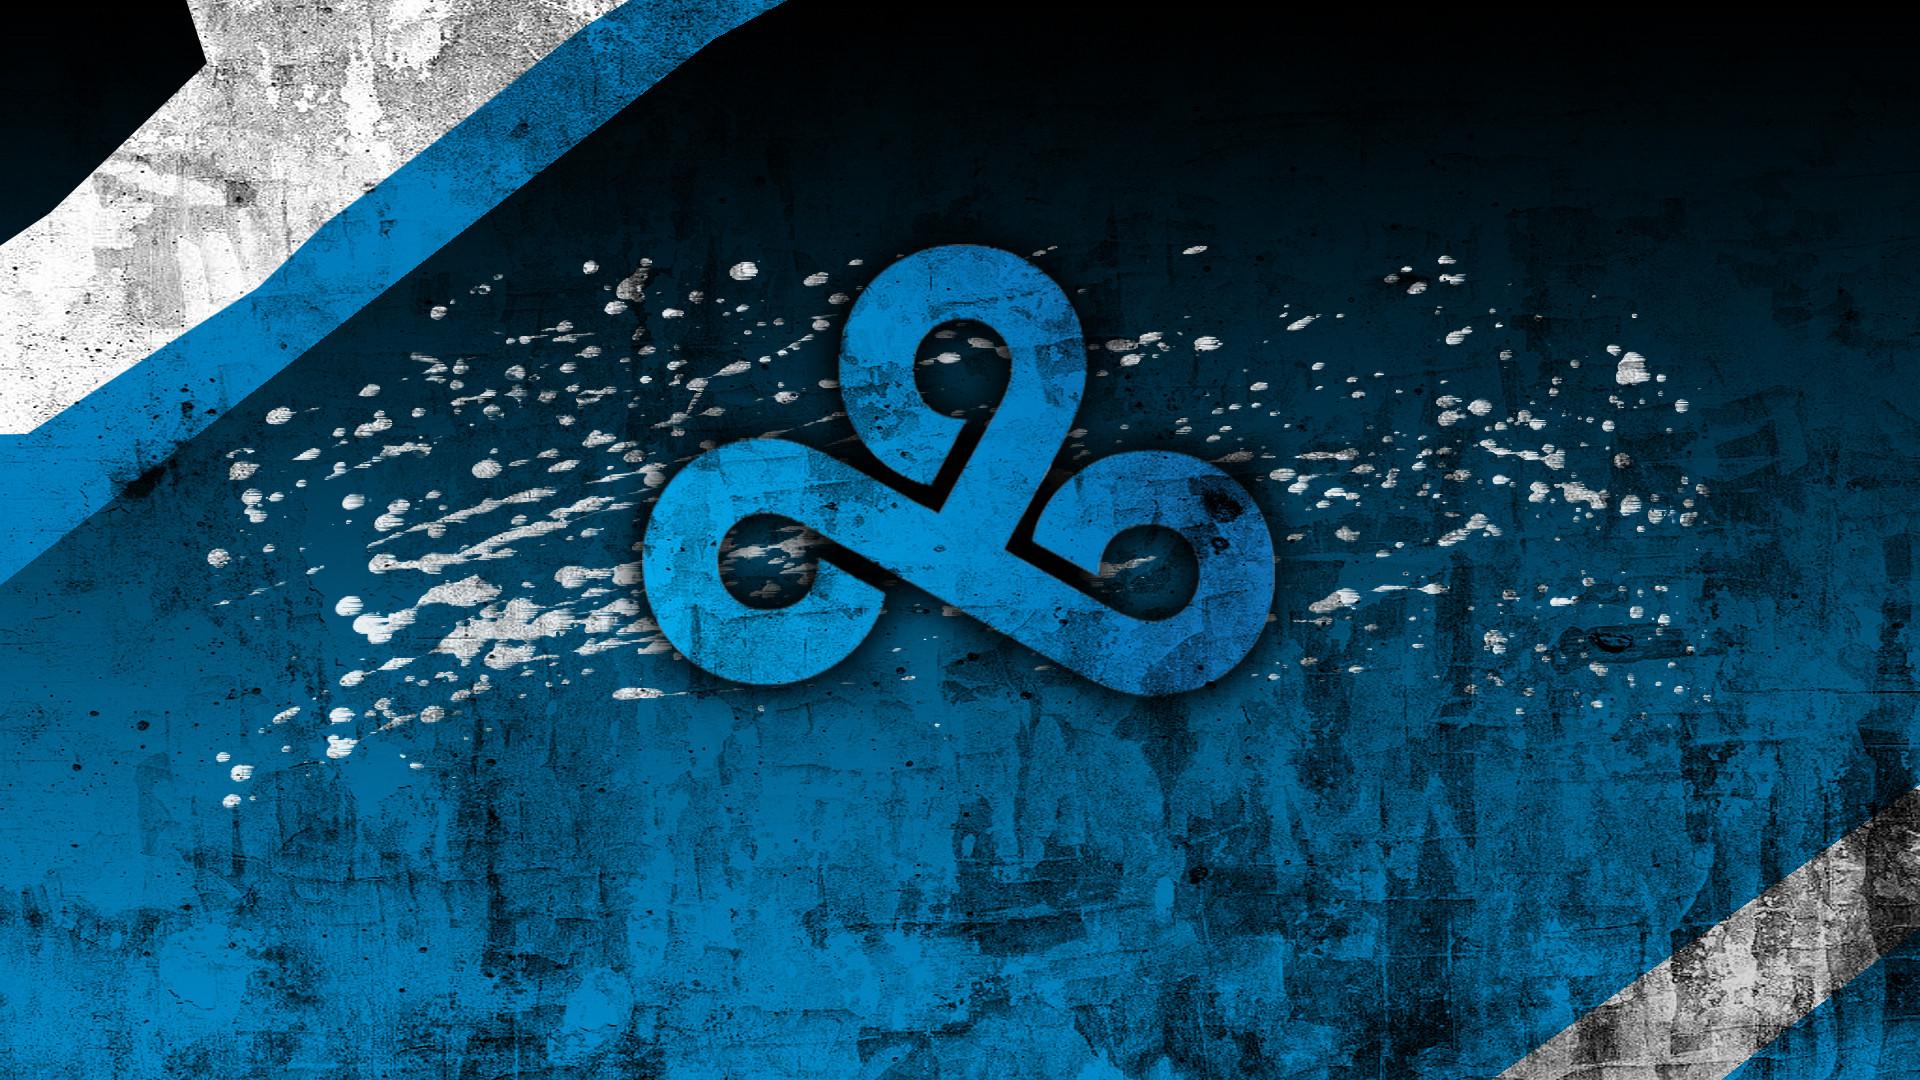 Csgo cloud 9 wallpaper wallpapersafari for Wallpaper to go